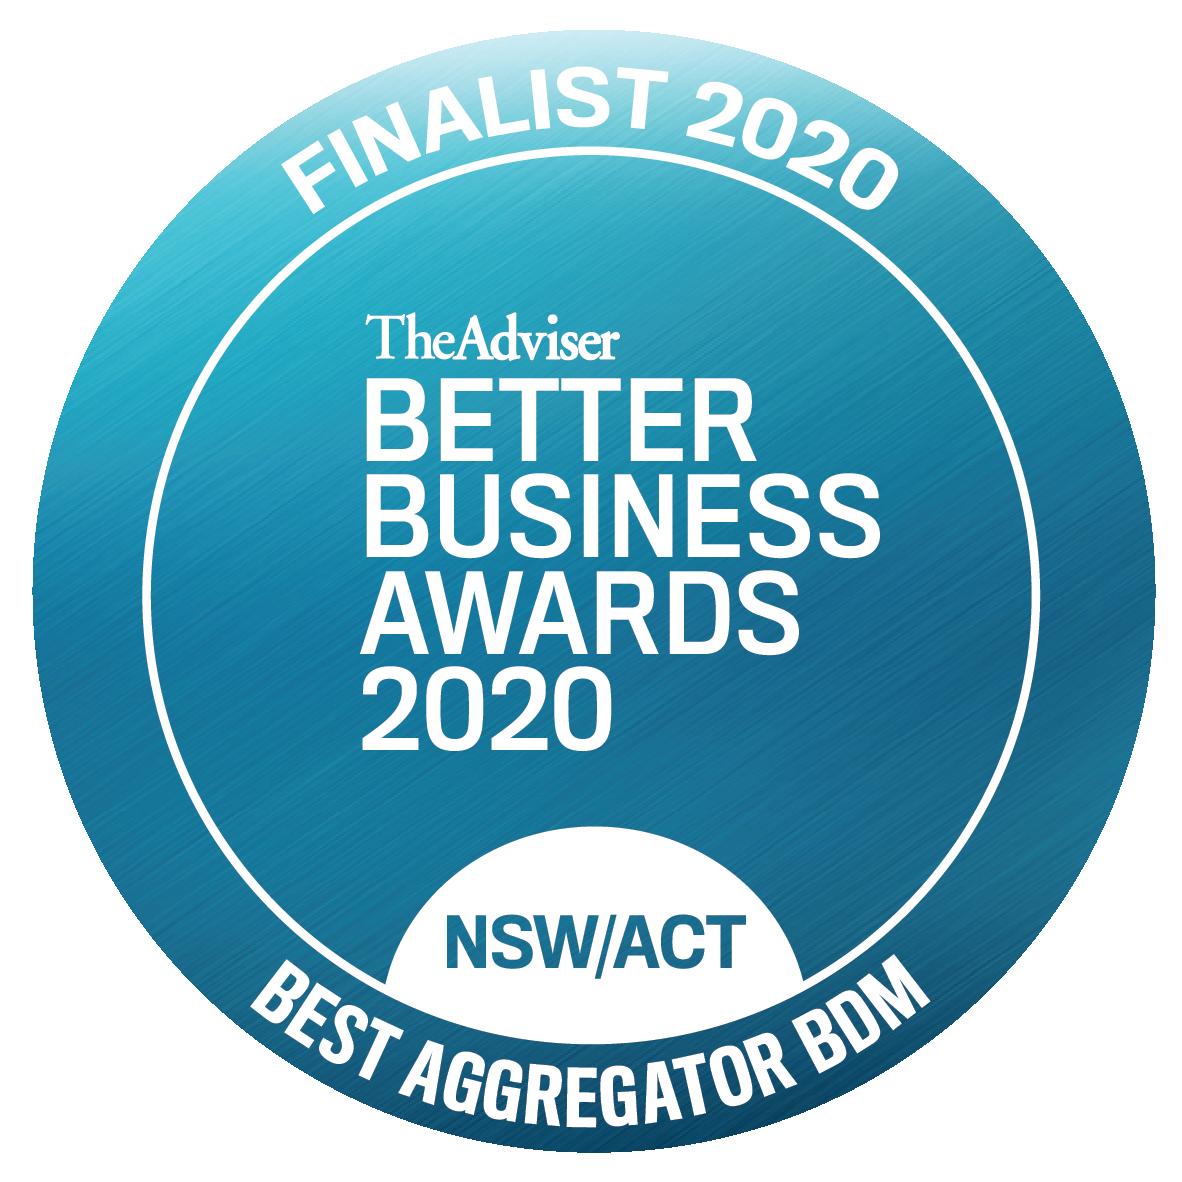 BBA 2020 finalist NSW Best Aggregator BDM